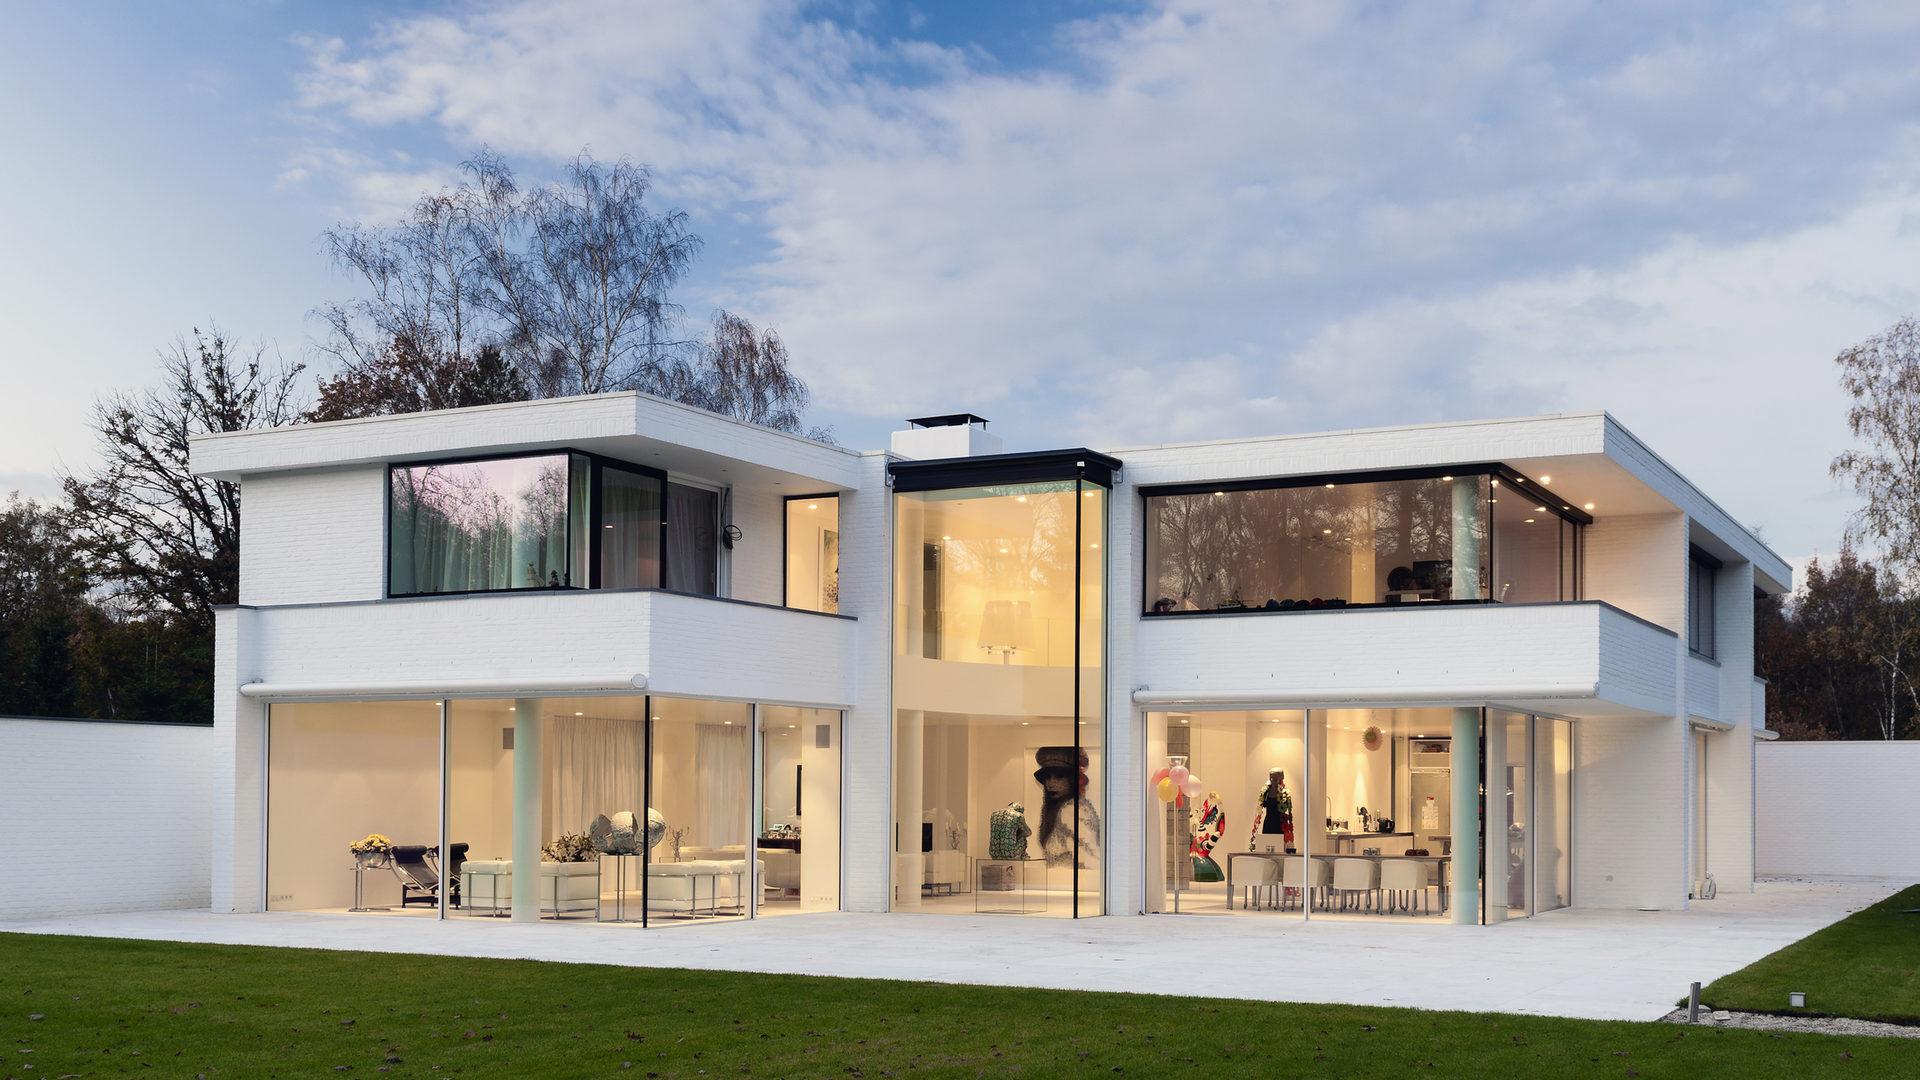 Sky House Design Centre | Sky House Design Centre